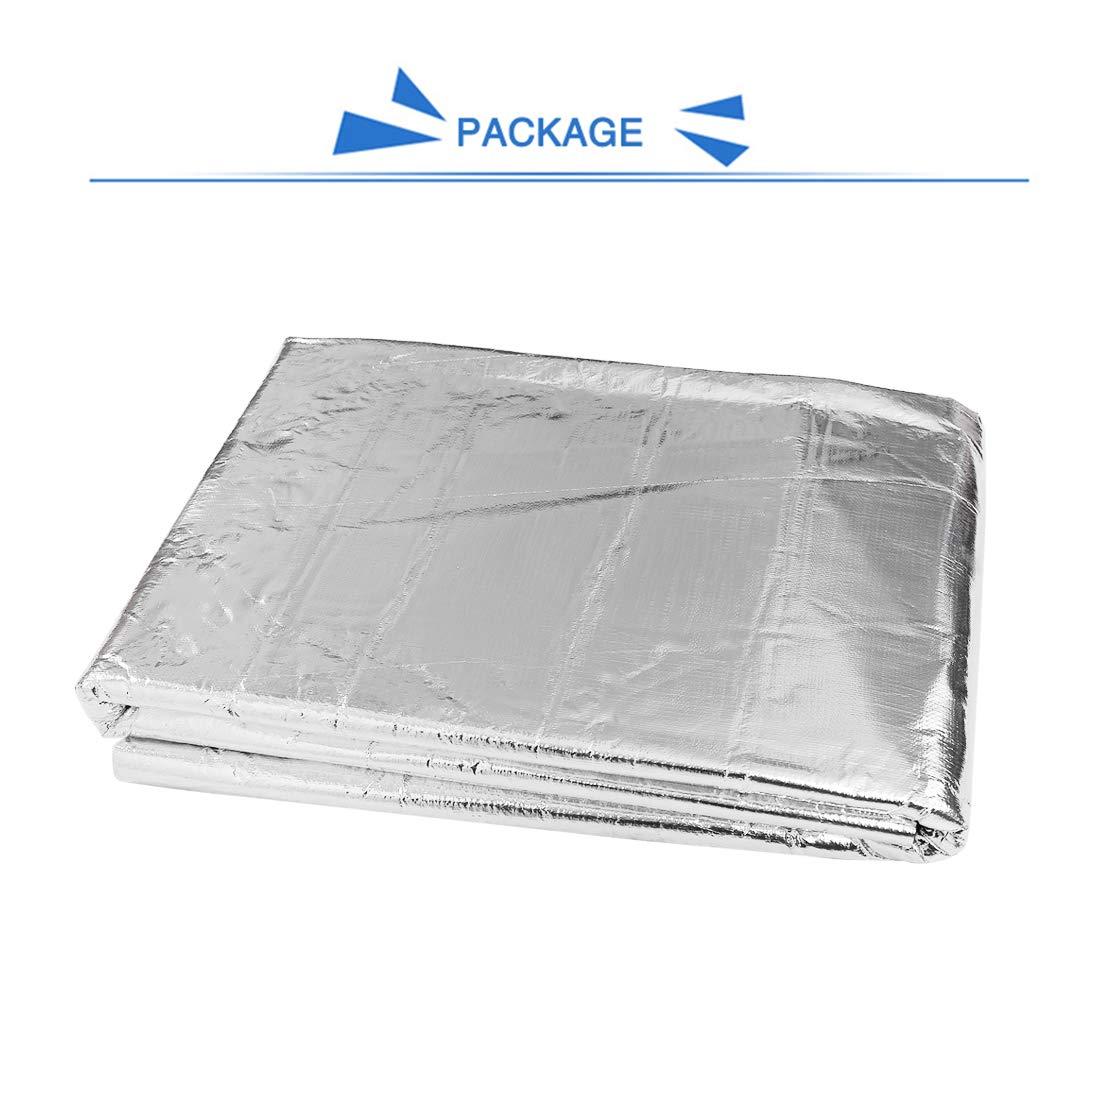 uxcell 197mil//5mm 43sqft Sound Deadening Heat Deadener Insulation Mat Intensive Alumium Foil Acoustic Barrier 157 inches x 39 inches// 400cm x 100cm